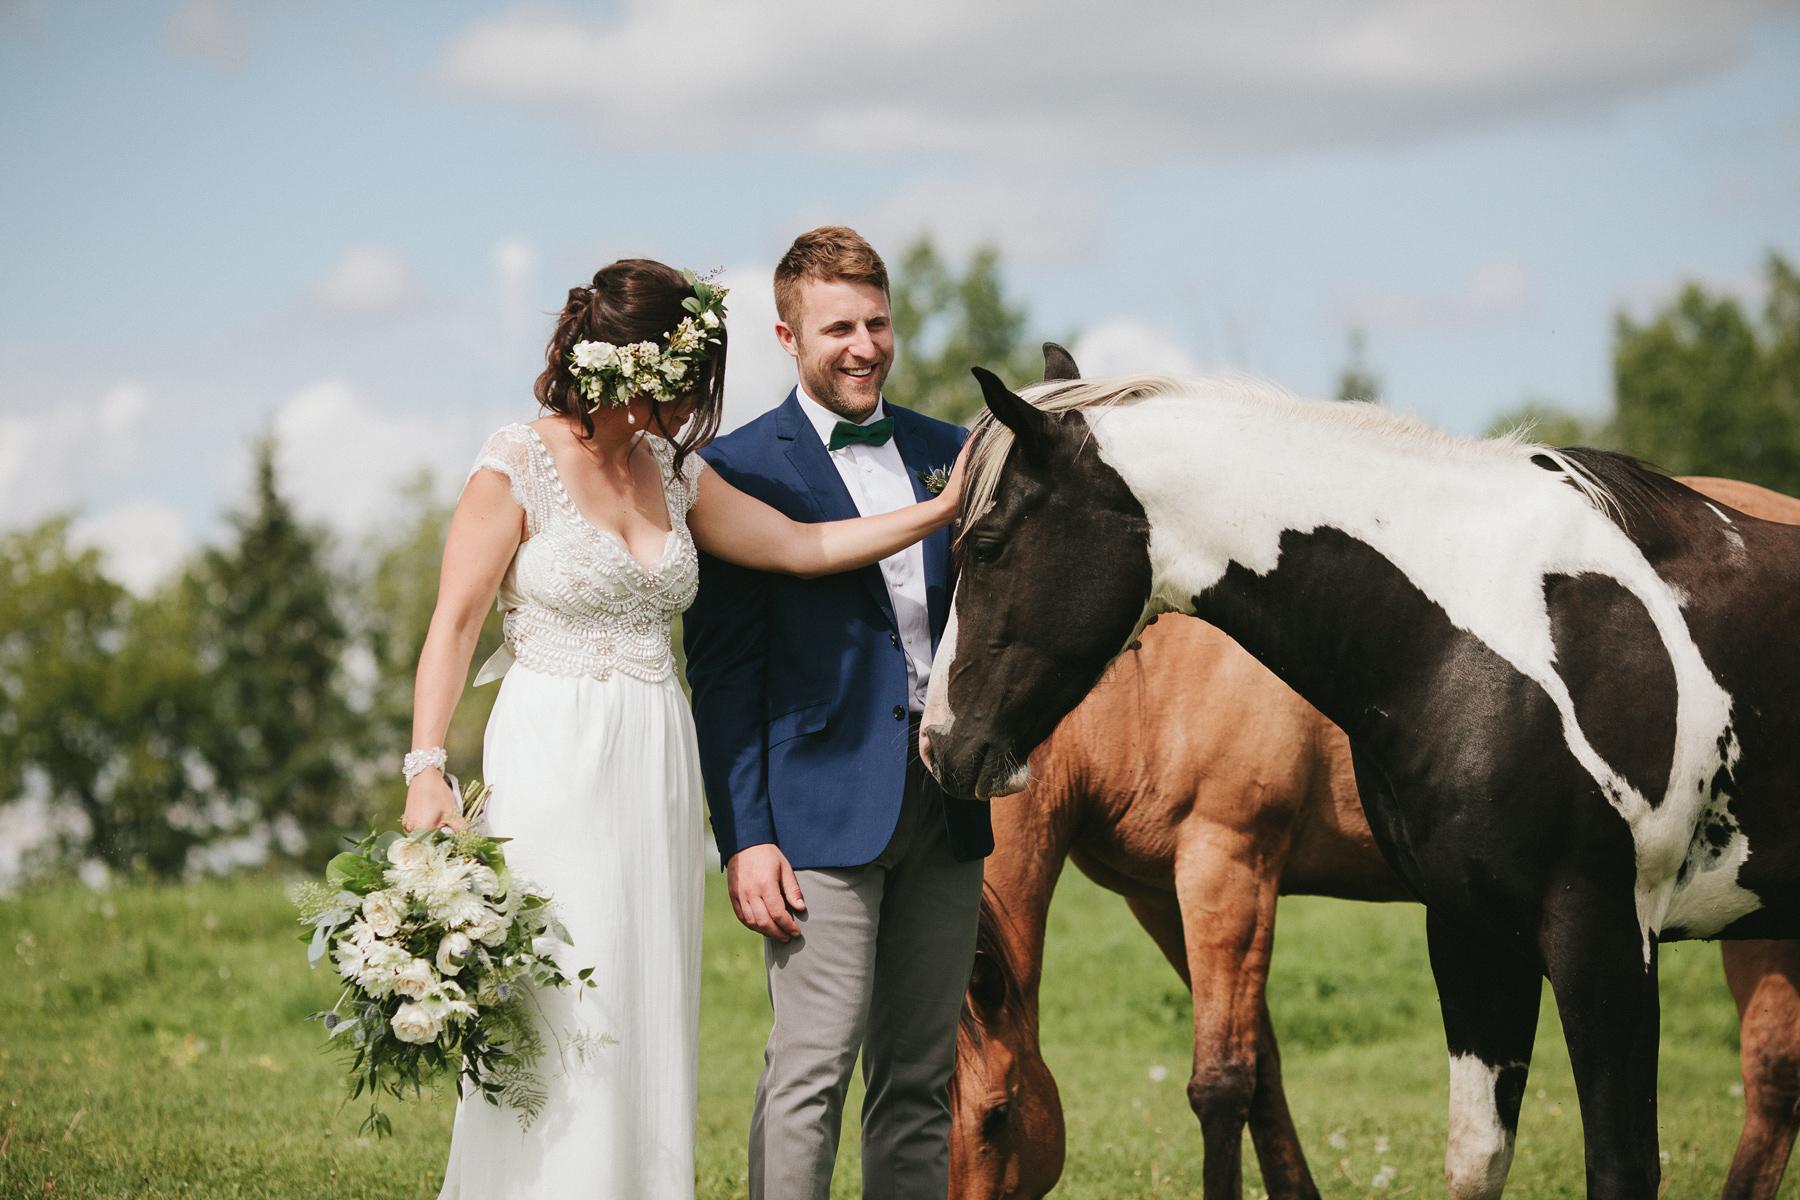 alberta-farm-wedding-photographer-rp-wj-072.jpg